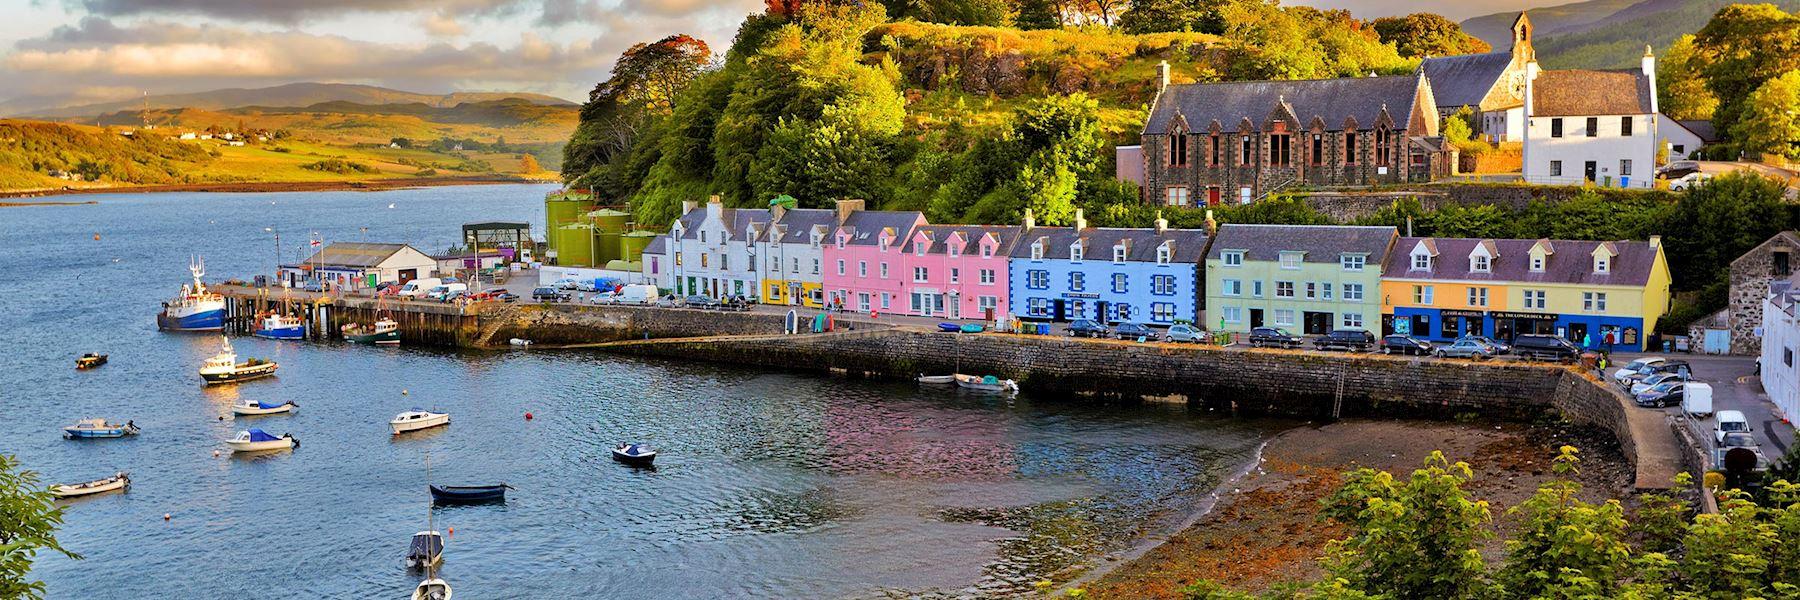 Scotland vacations